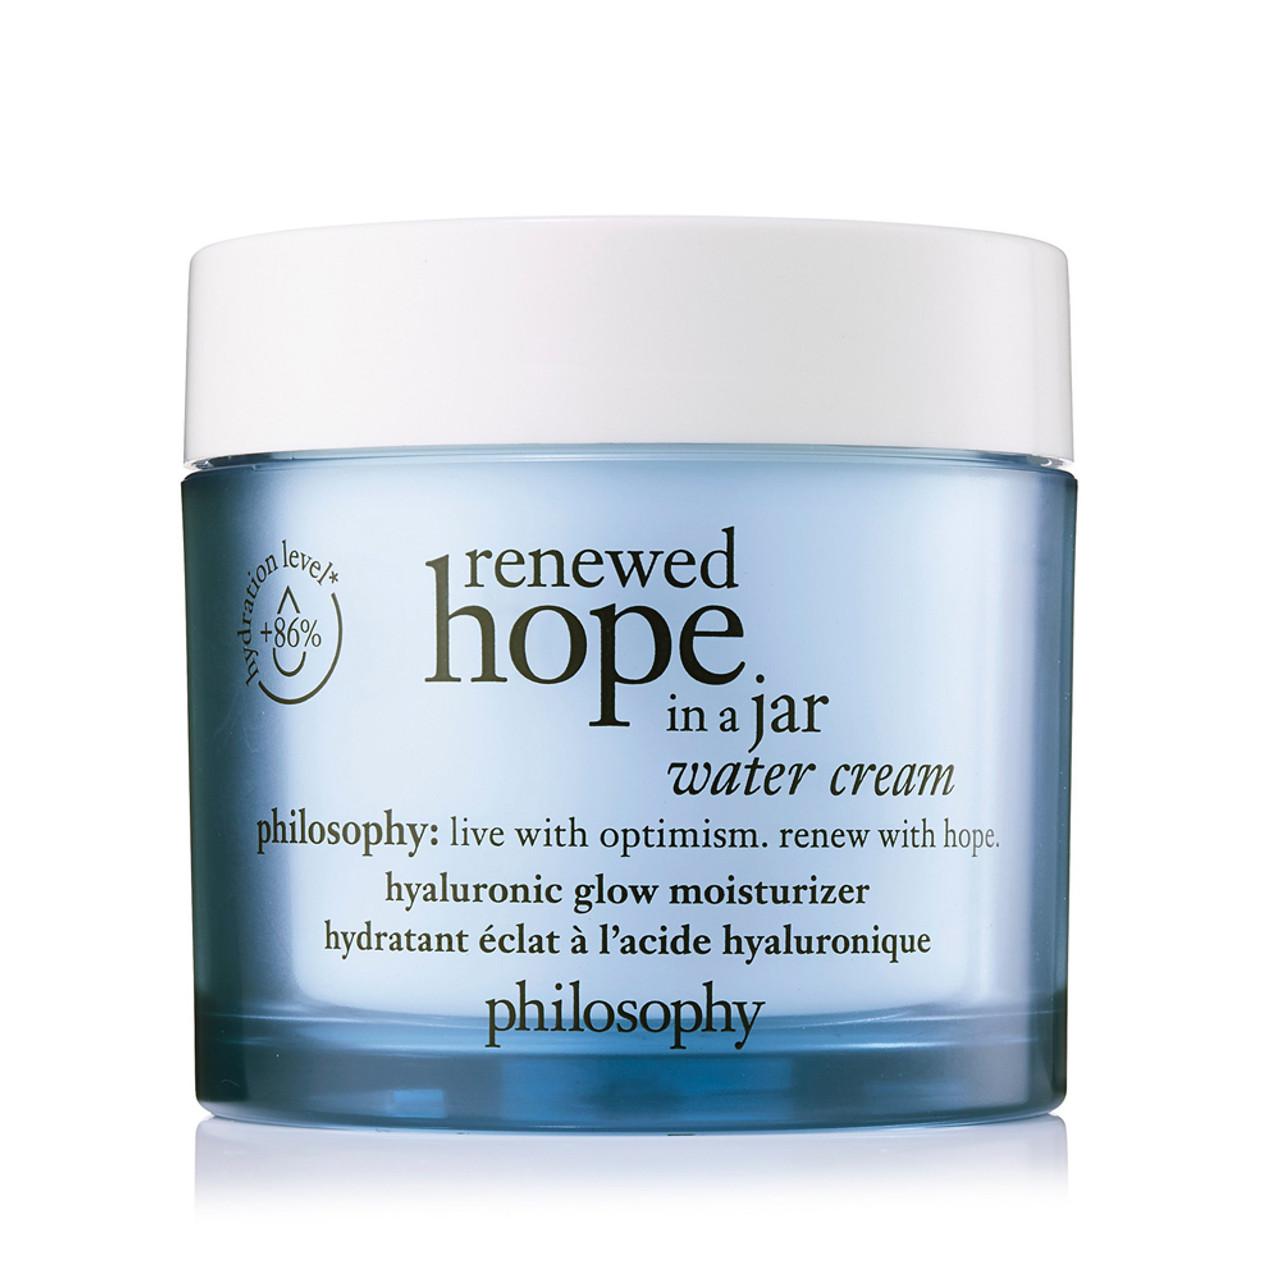 philosophy Renewed Hope in a Jar Water Cream BeautifiedYou.com